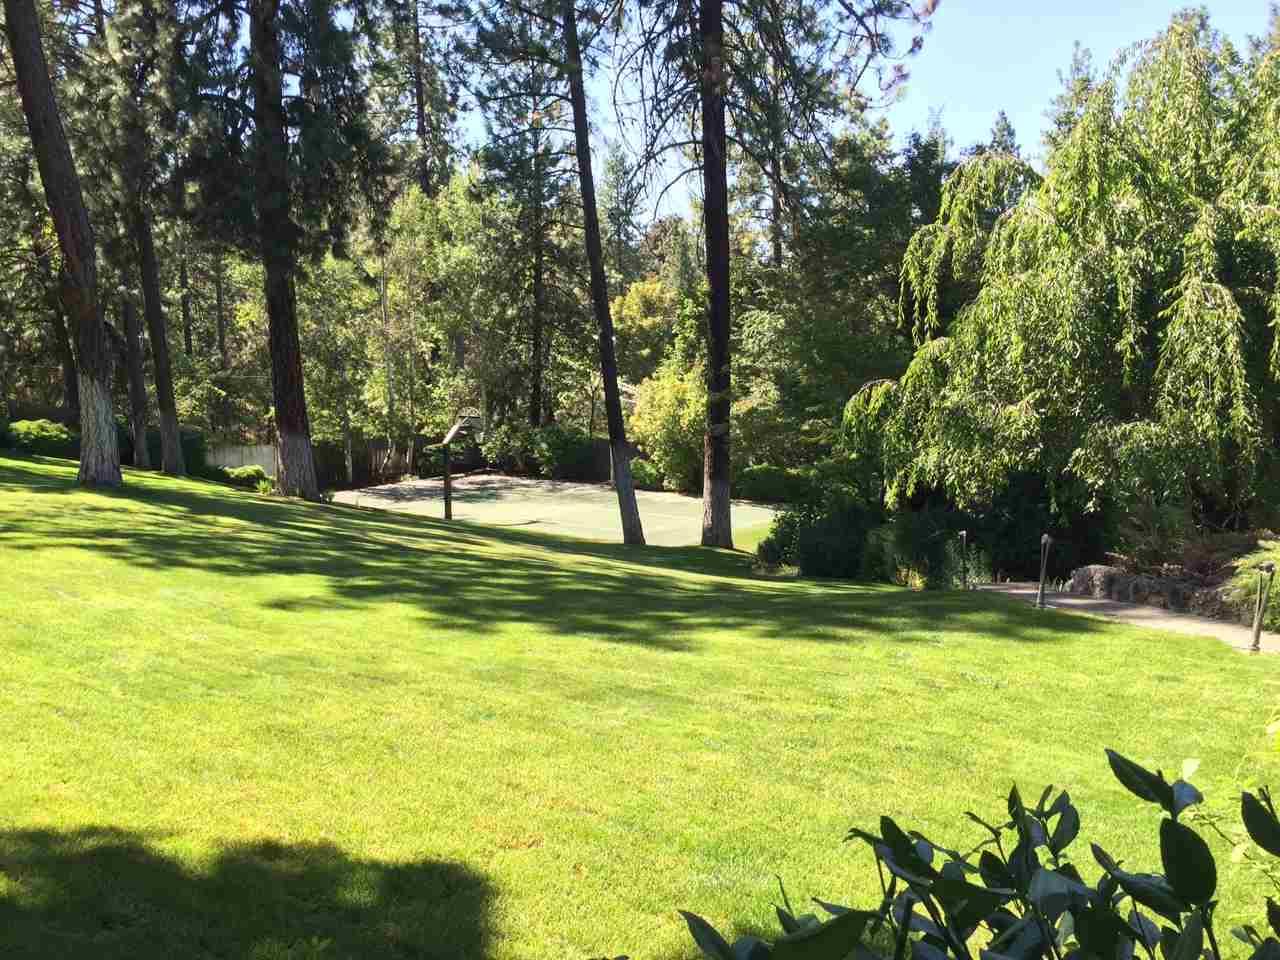 1612 S Crest Hill Dr , Spokane, WA - USA (photo 2)